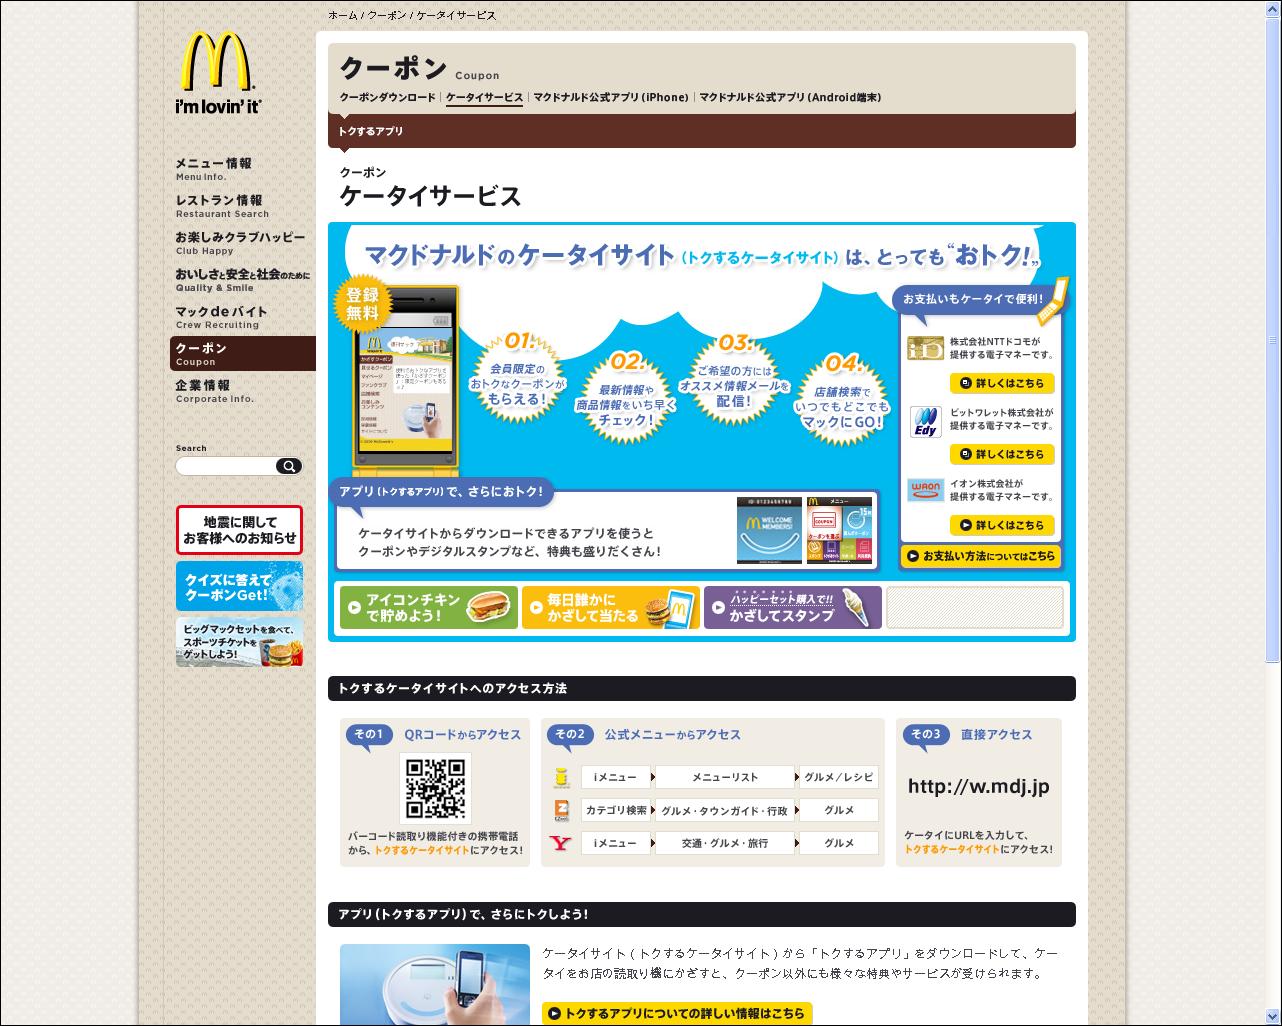 Mcdonalds digital coupons